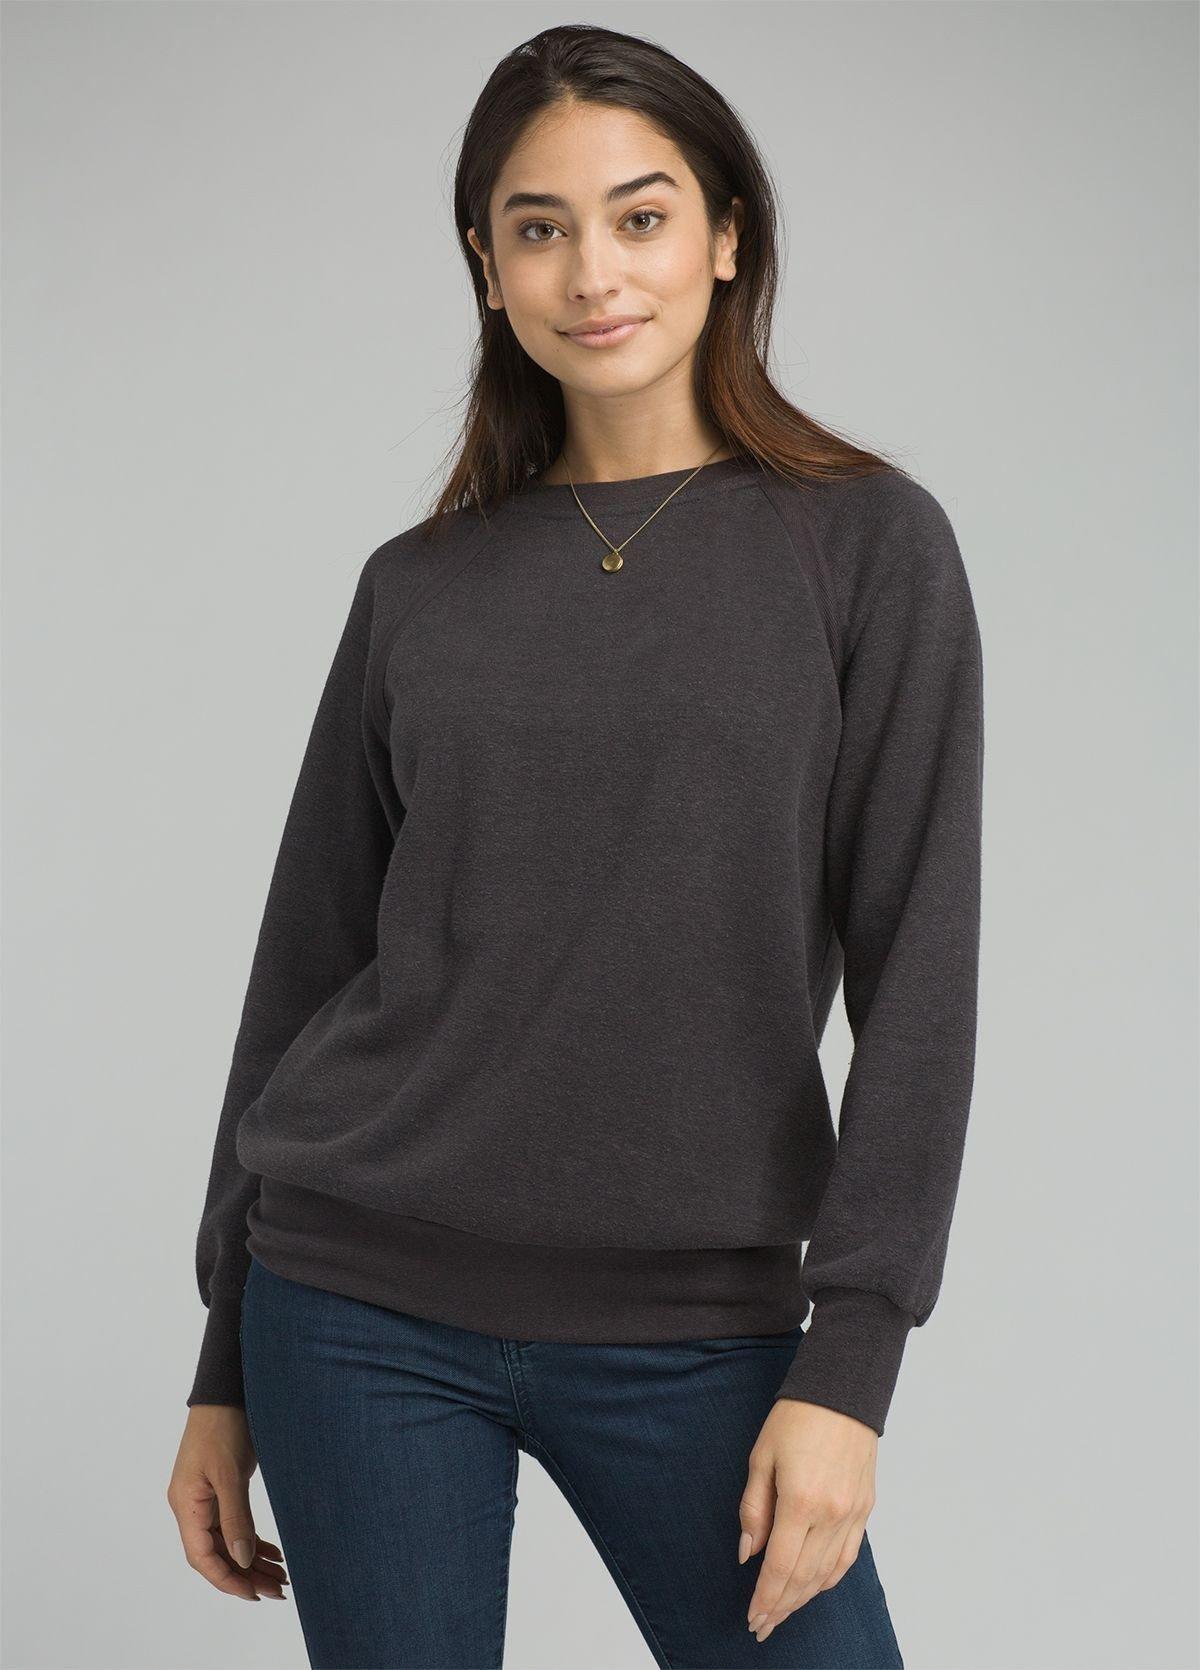 prAna Cozy Up Sweatshirt JRI1PRANACUS